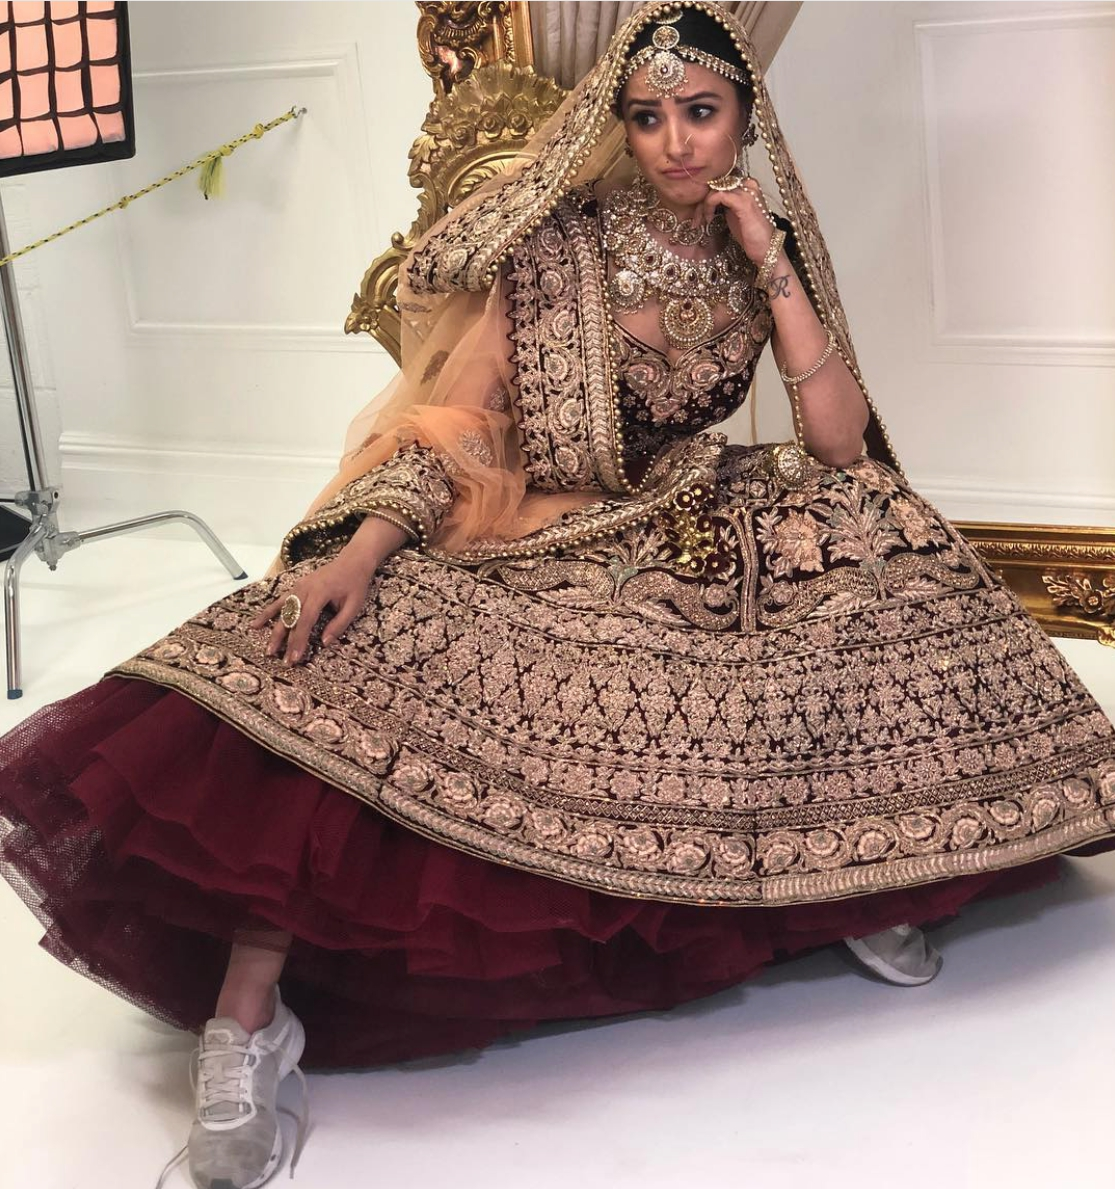 The Tradi-modern Bride